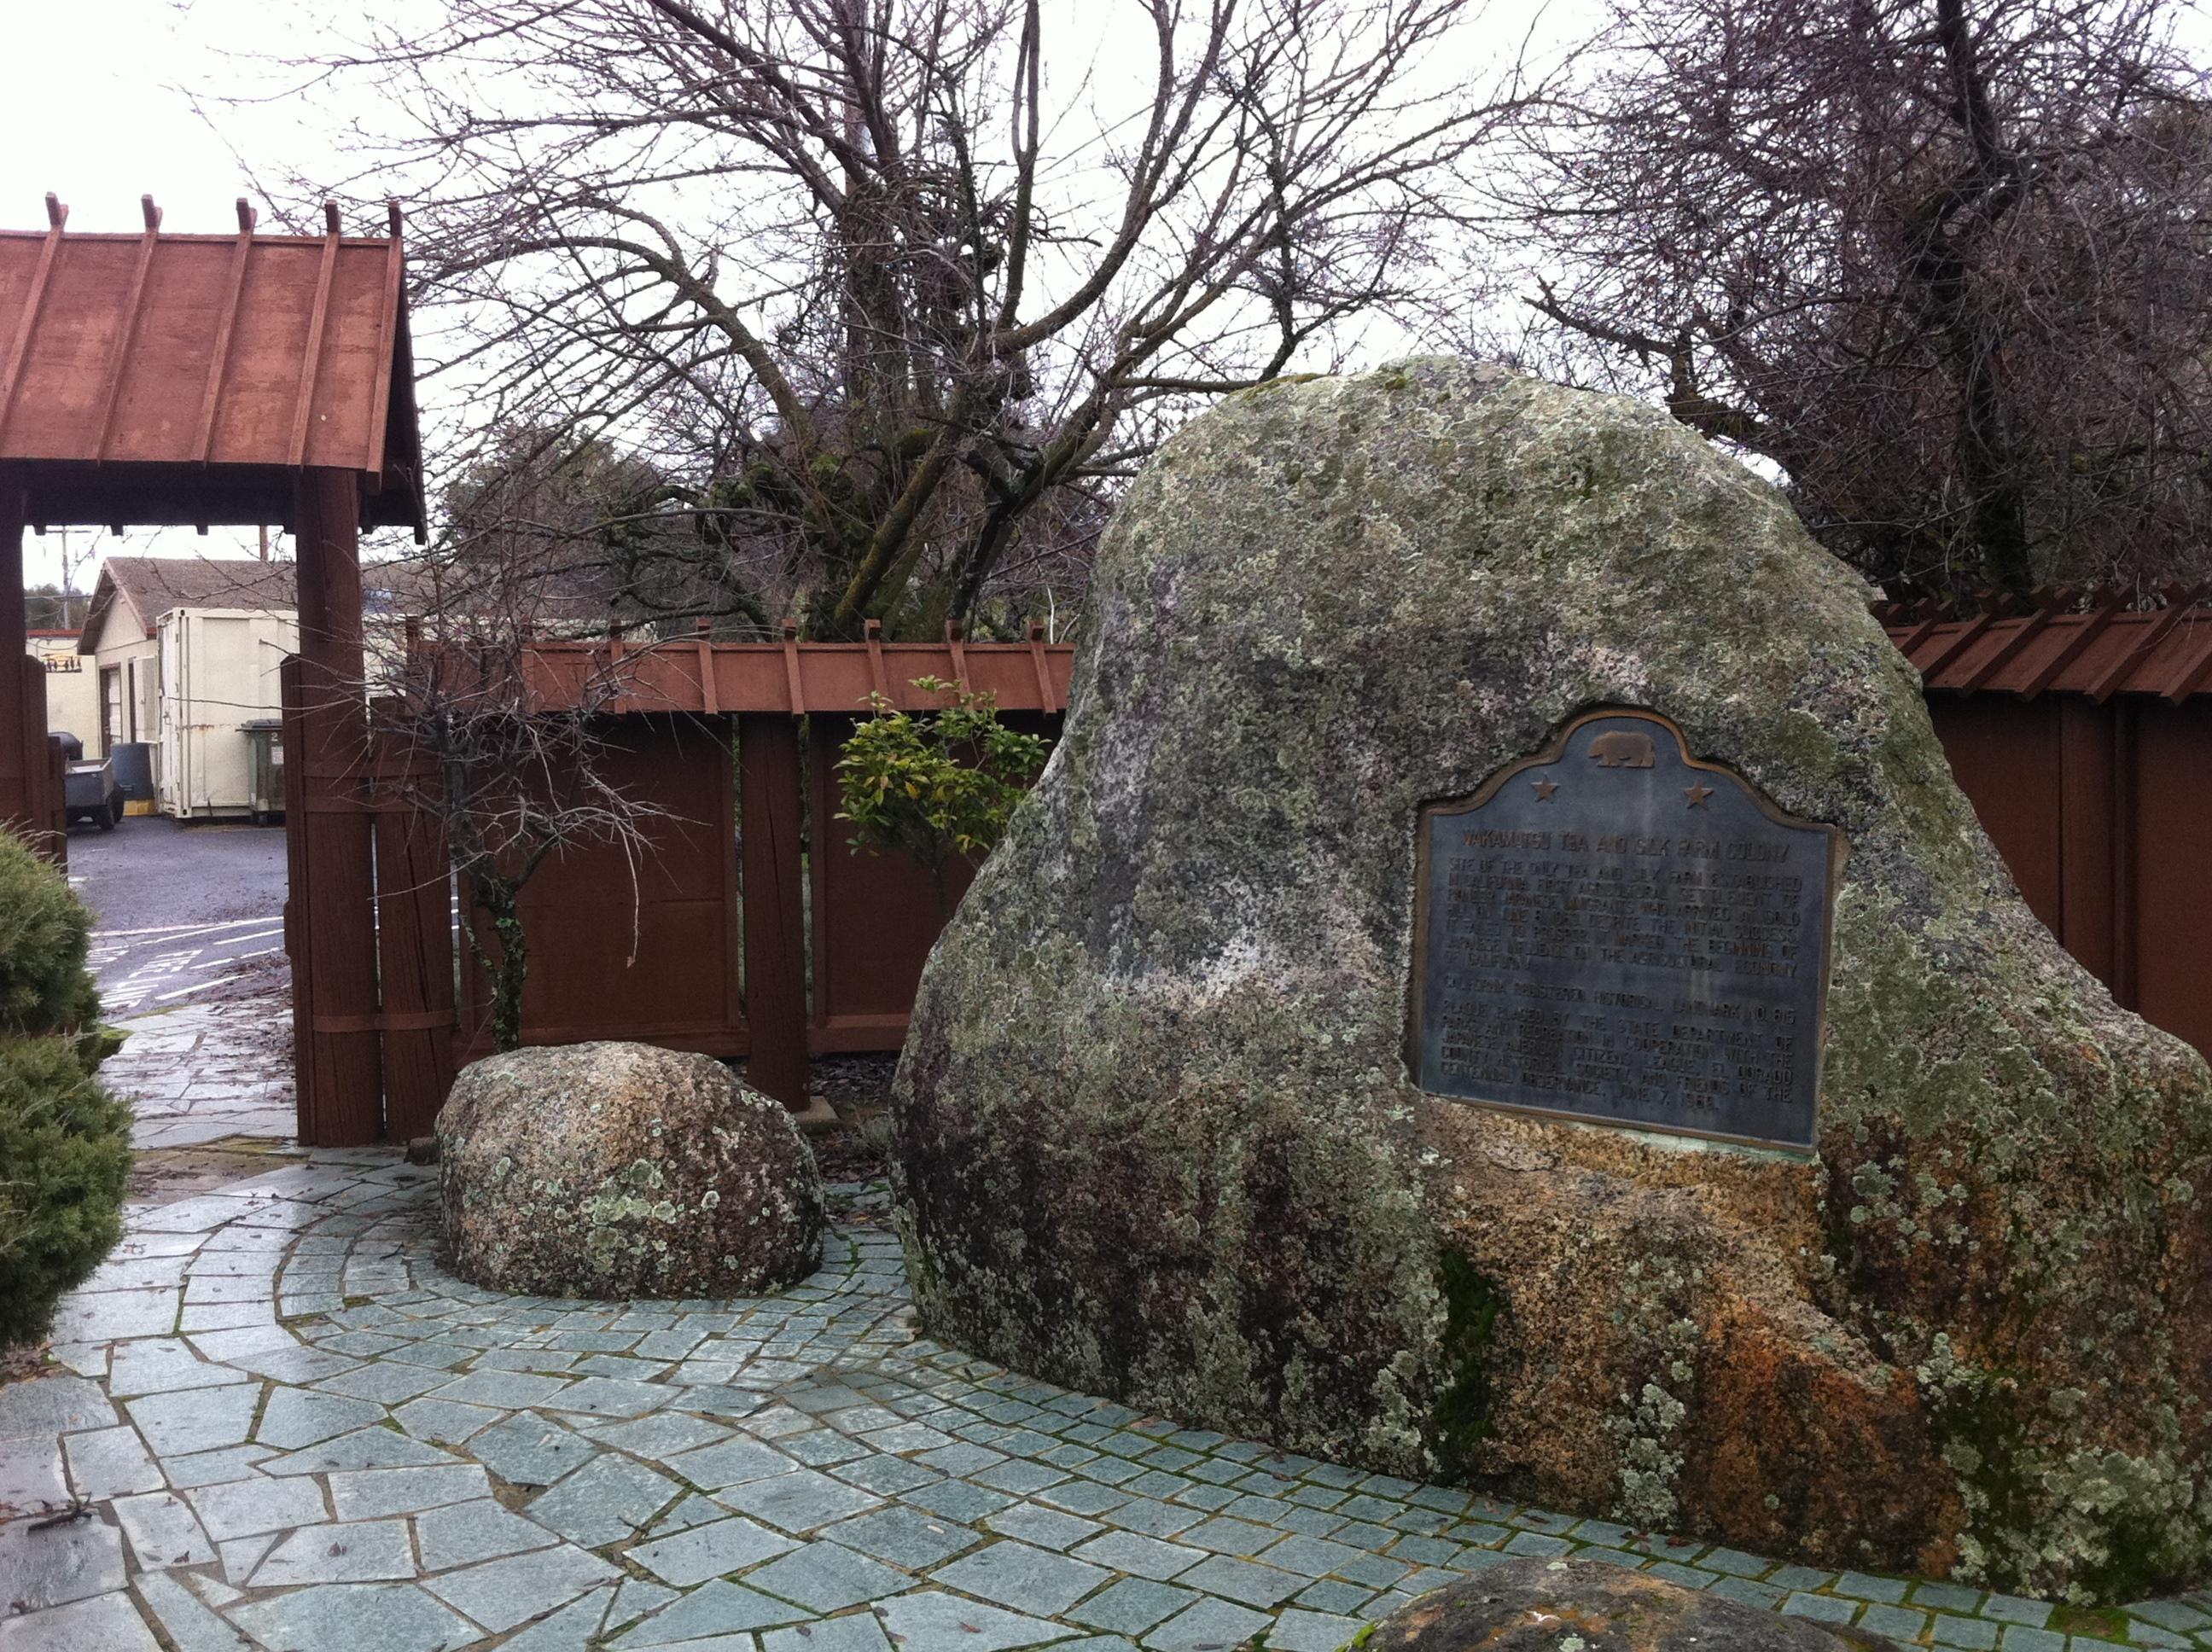 The Wakamatsu Tea and Silk Farm Colony